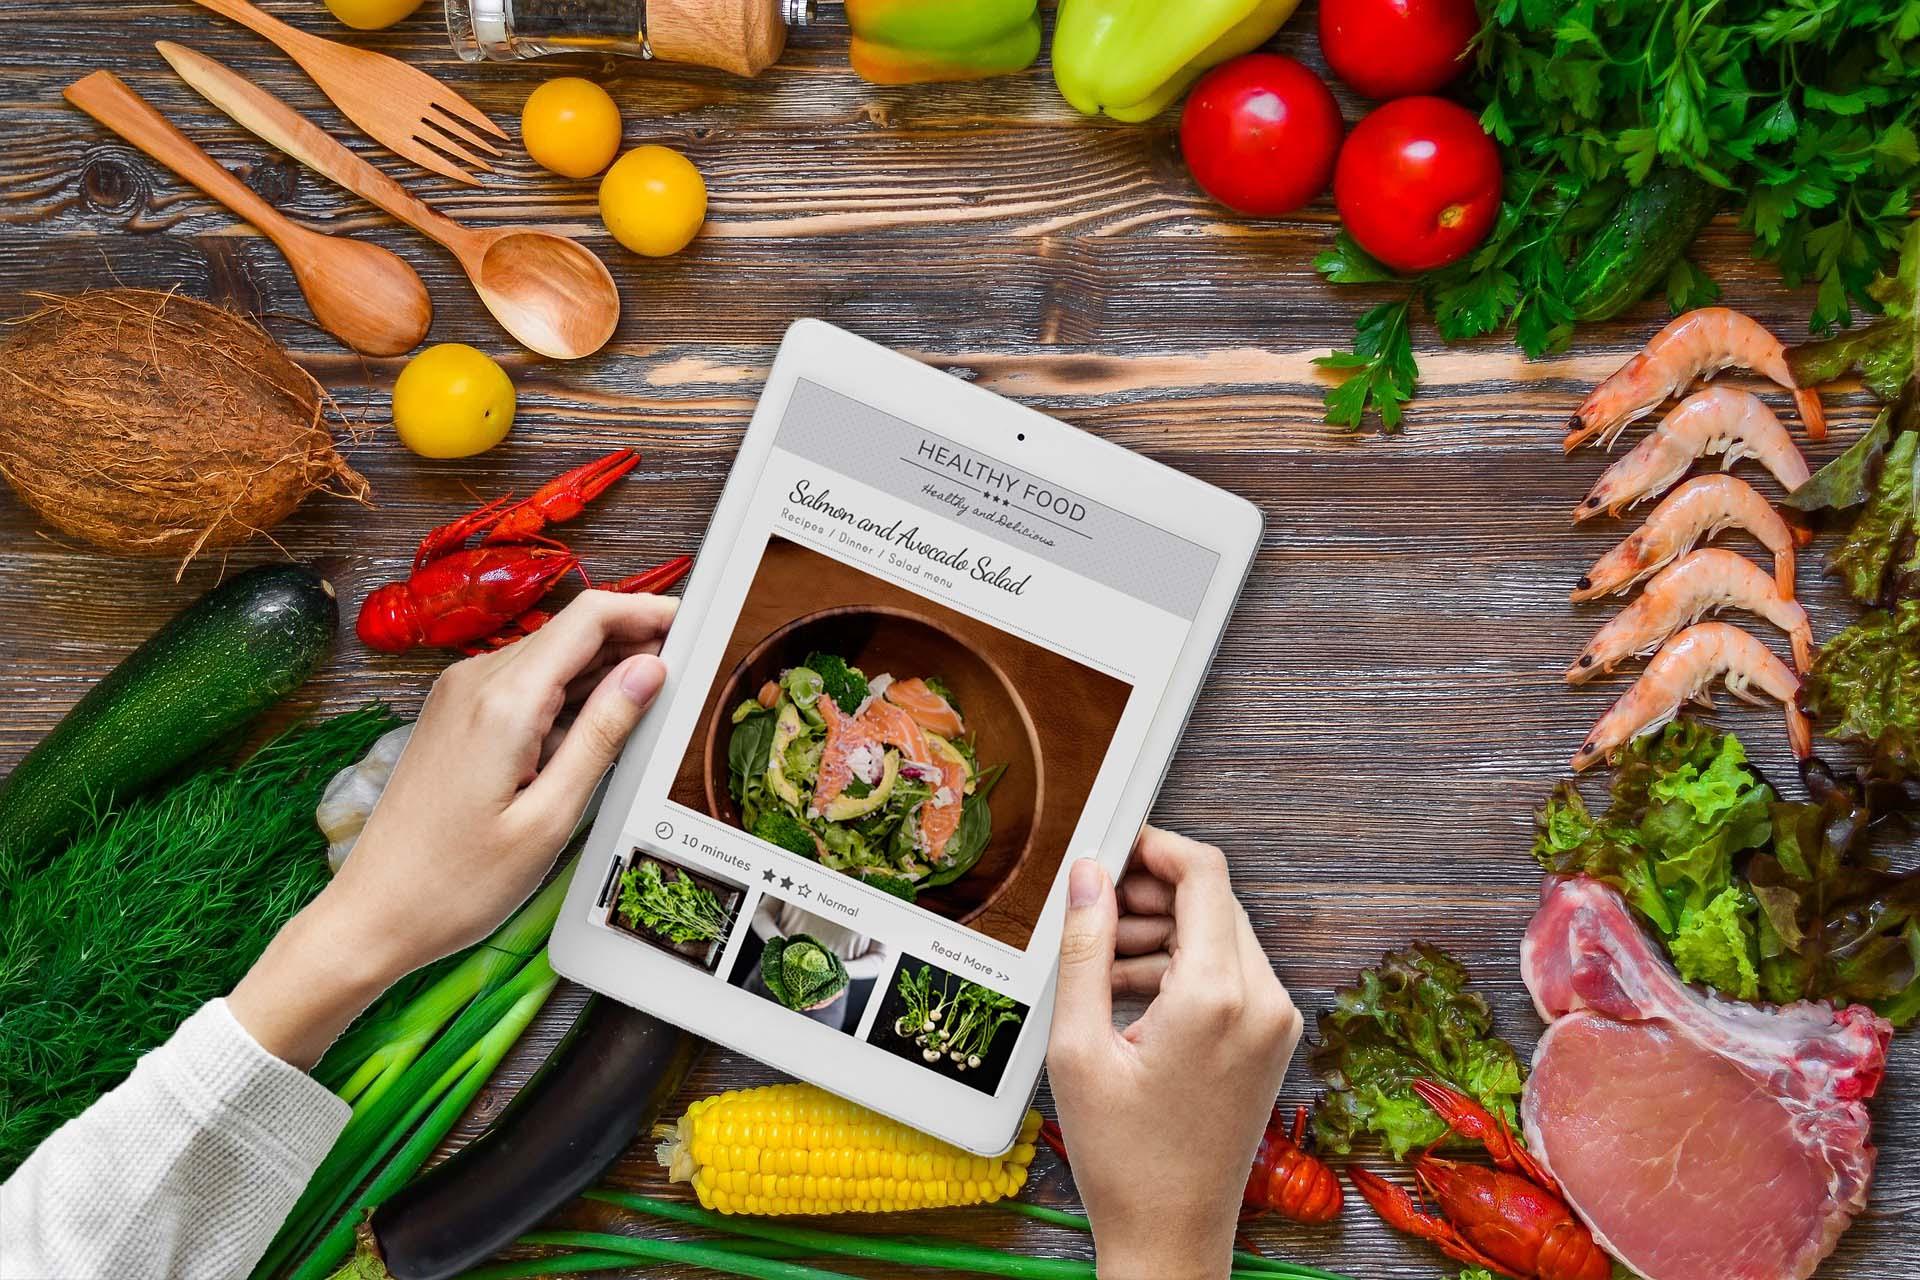 viaindiankitchen online recipes